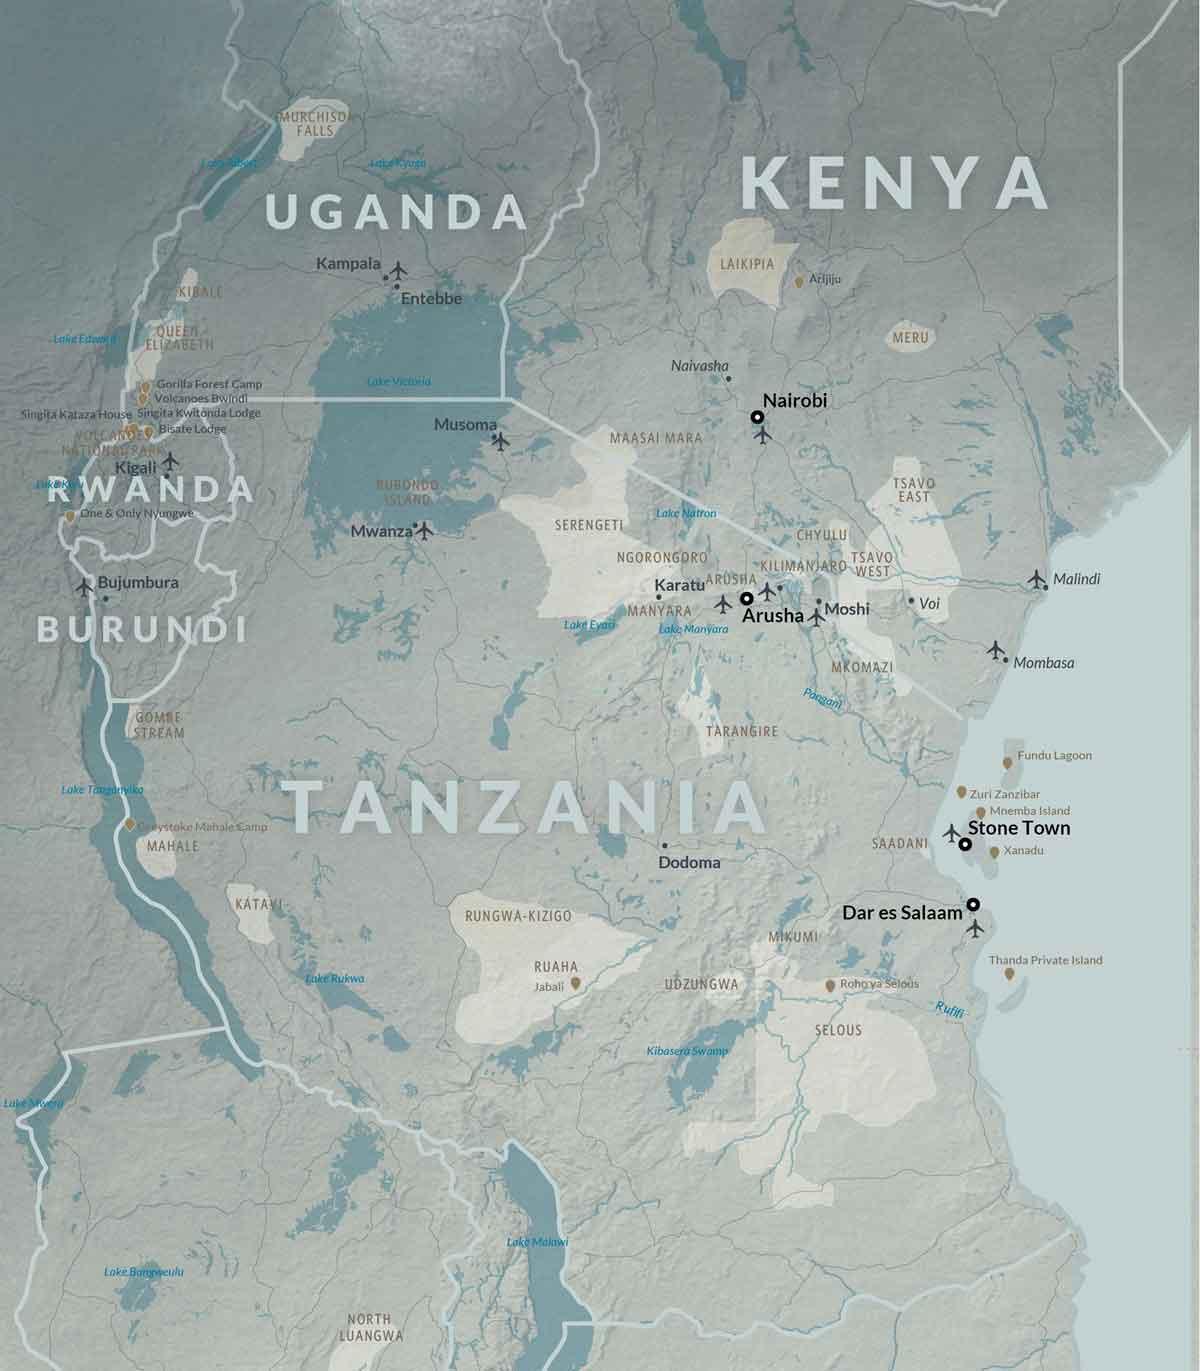 Detailed map of East Africa including Kenya, Uganda, Tanzania, Rwanda and Burundi